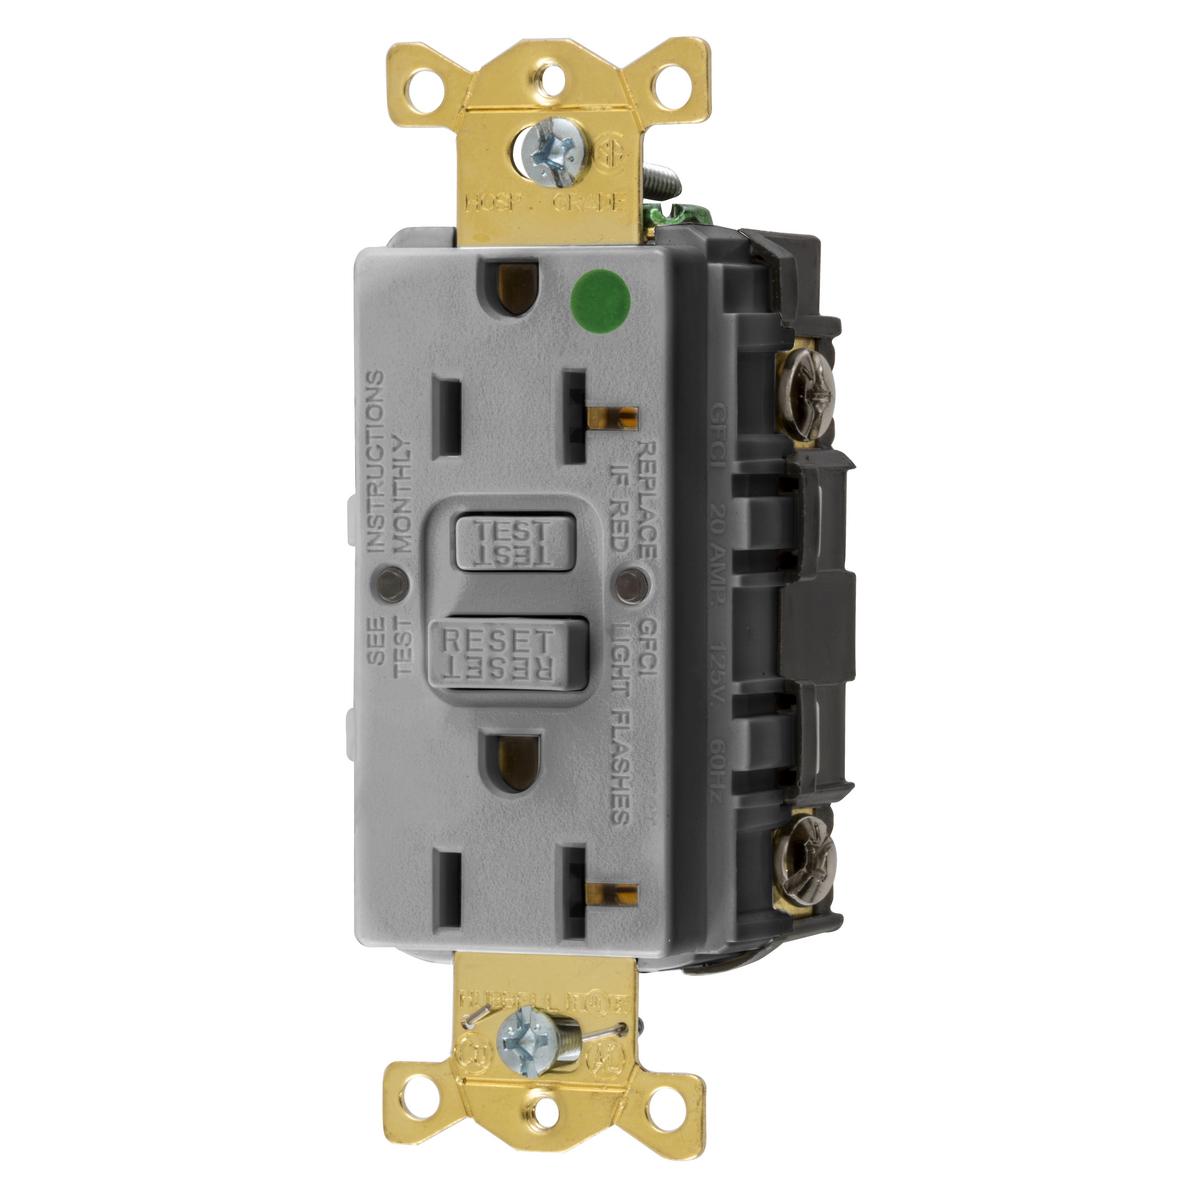 GFRST83GY | Brand | Wiring Device - Kellems